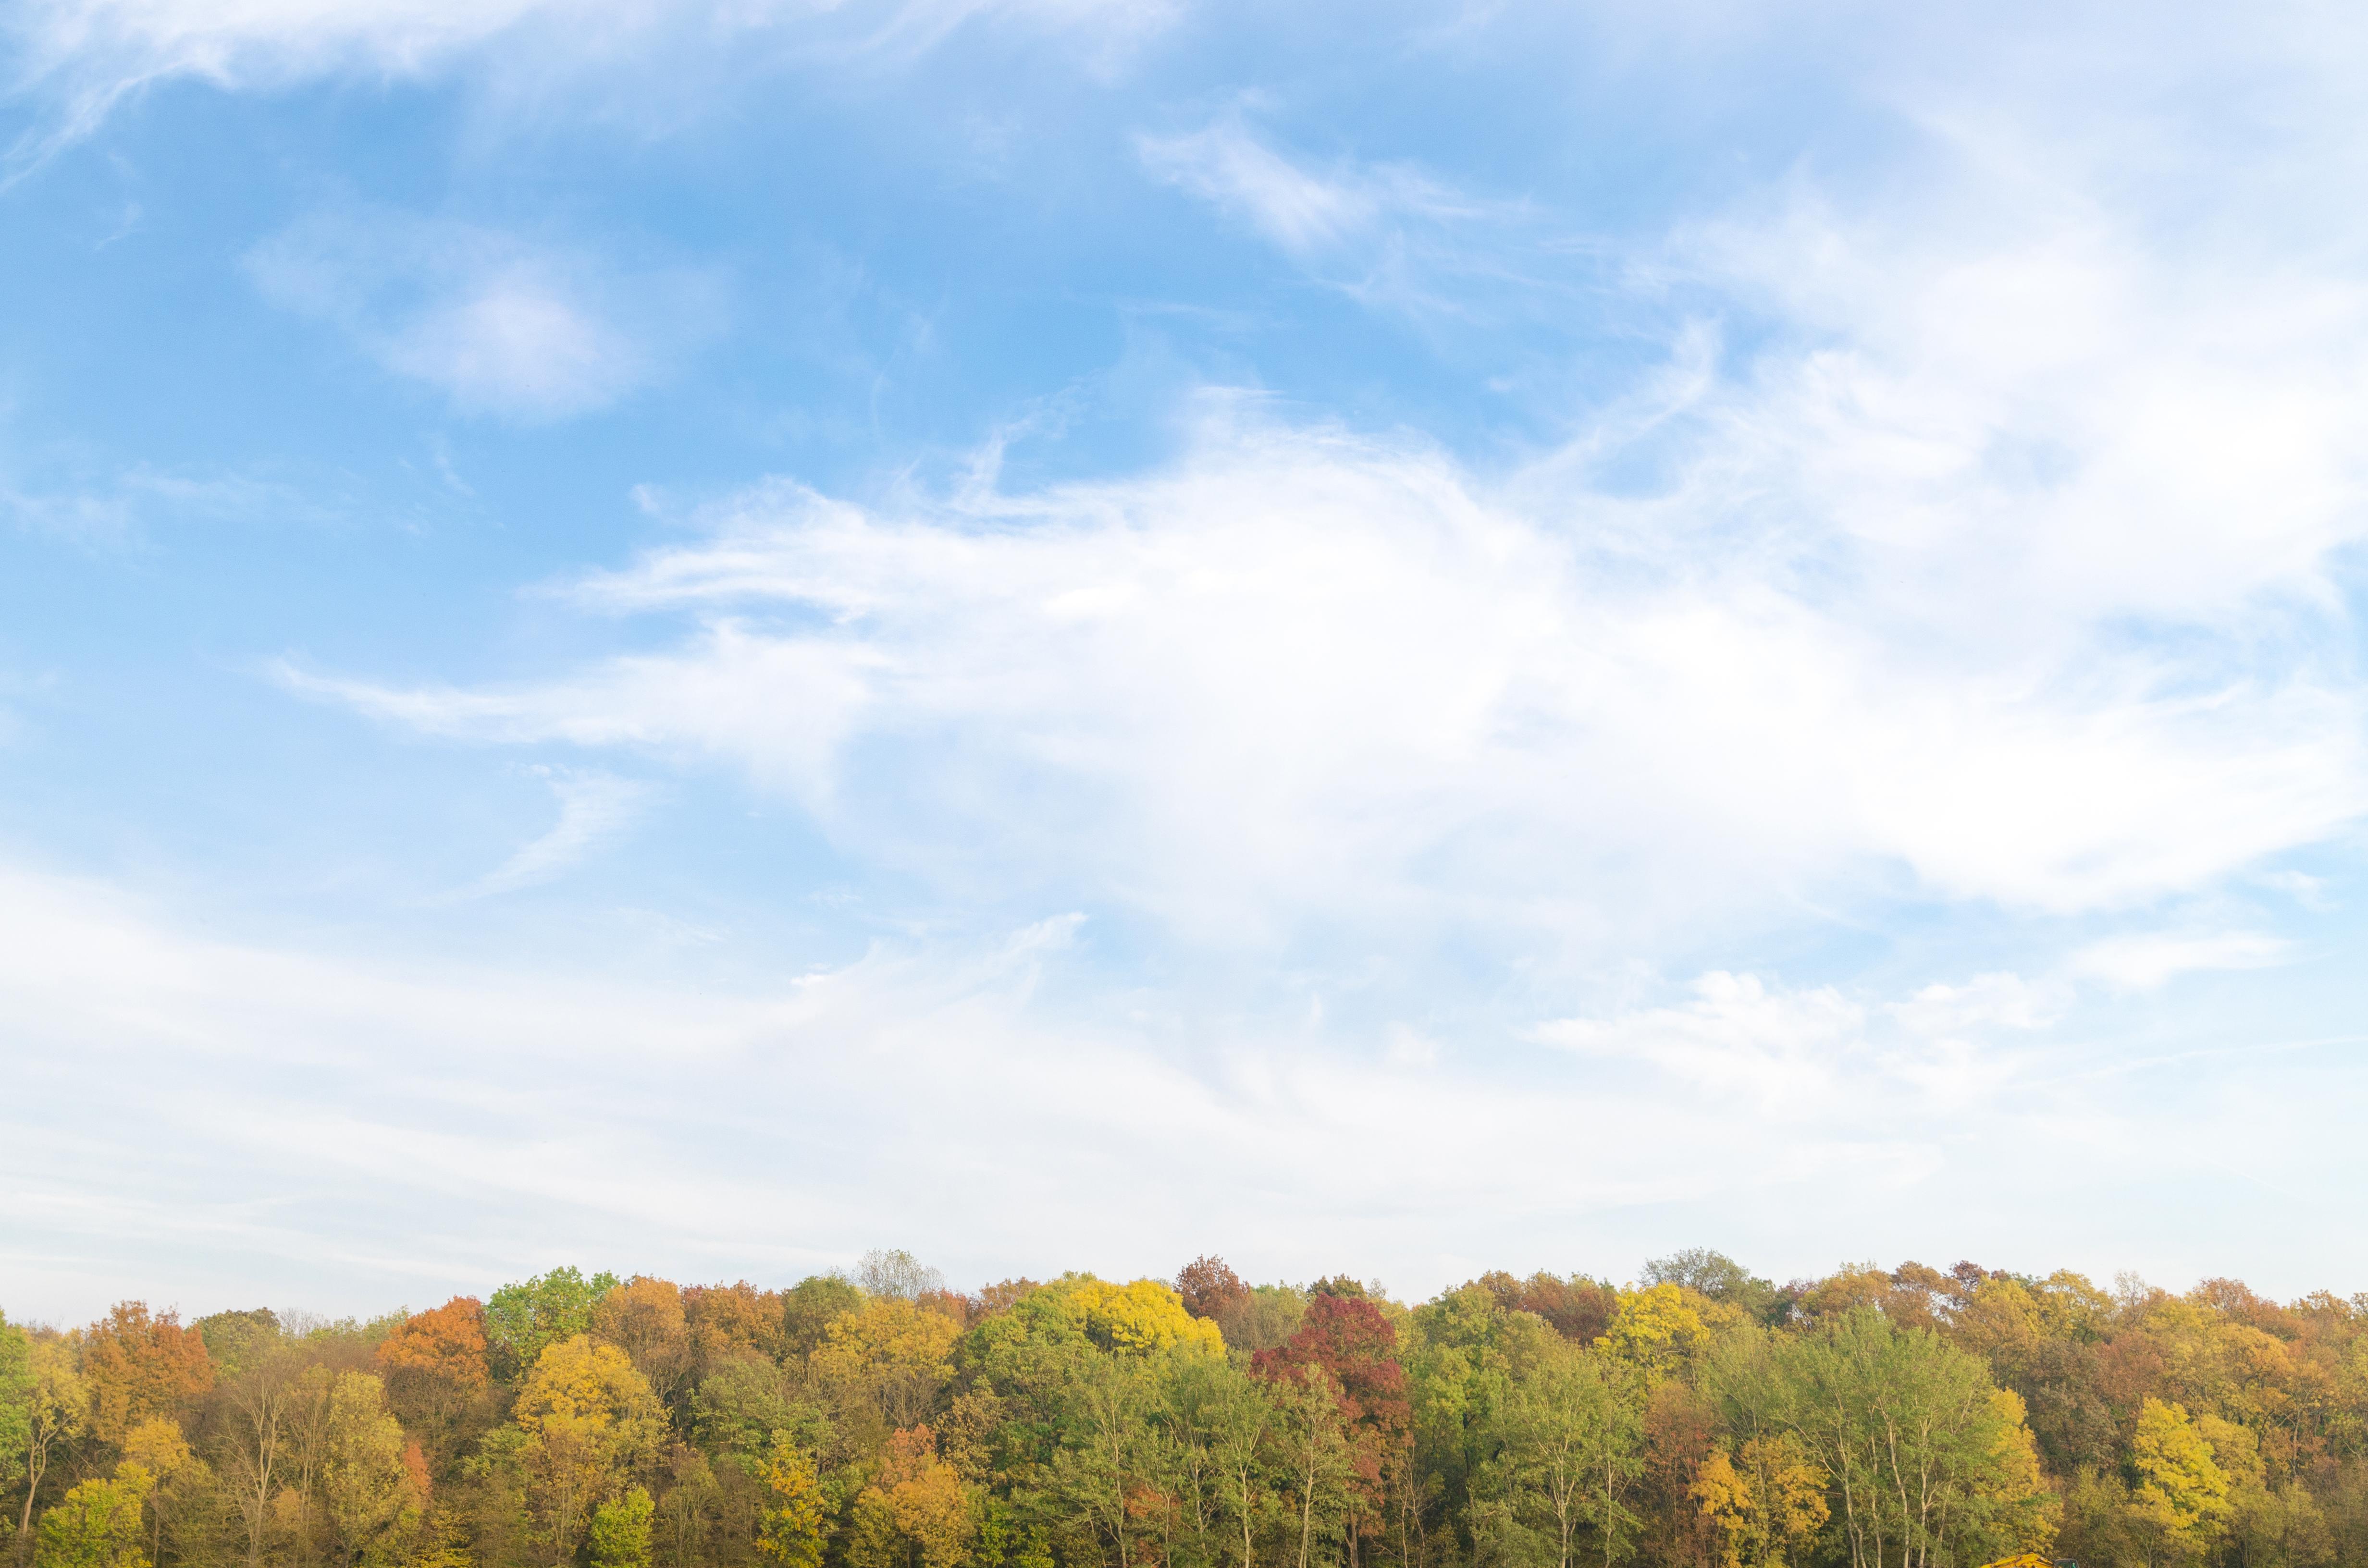 Panoramic Wallpaper Fall 1000 Engaging Sky Background Photos 183 Pexels 183 Free Stock